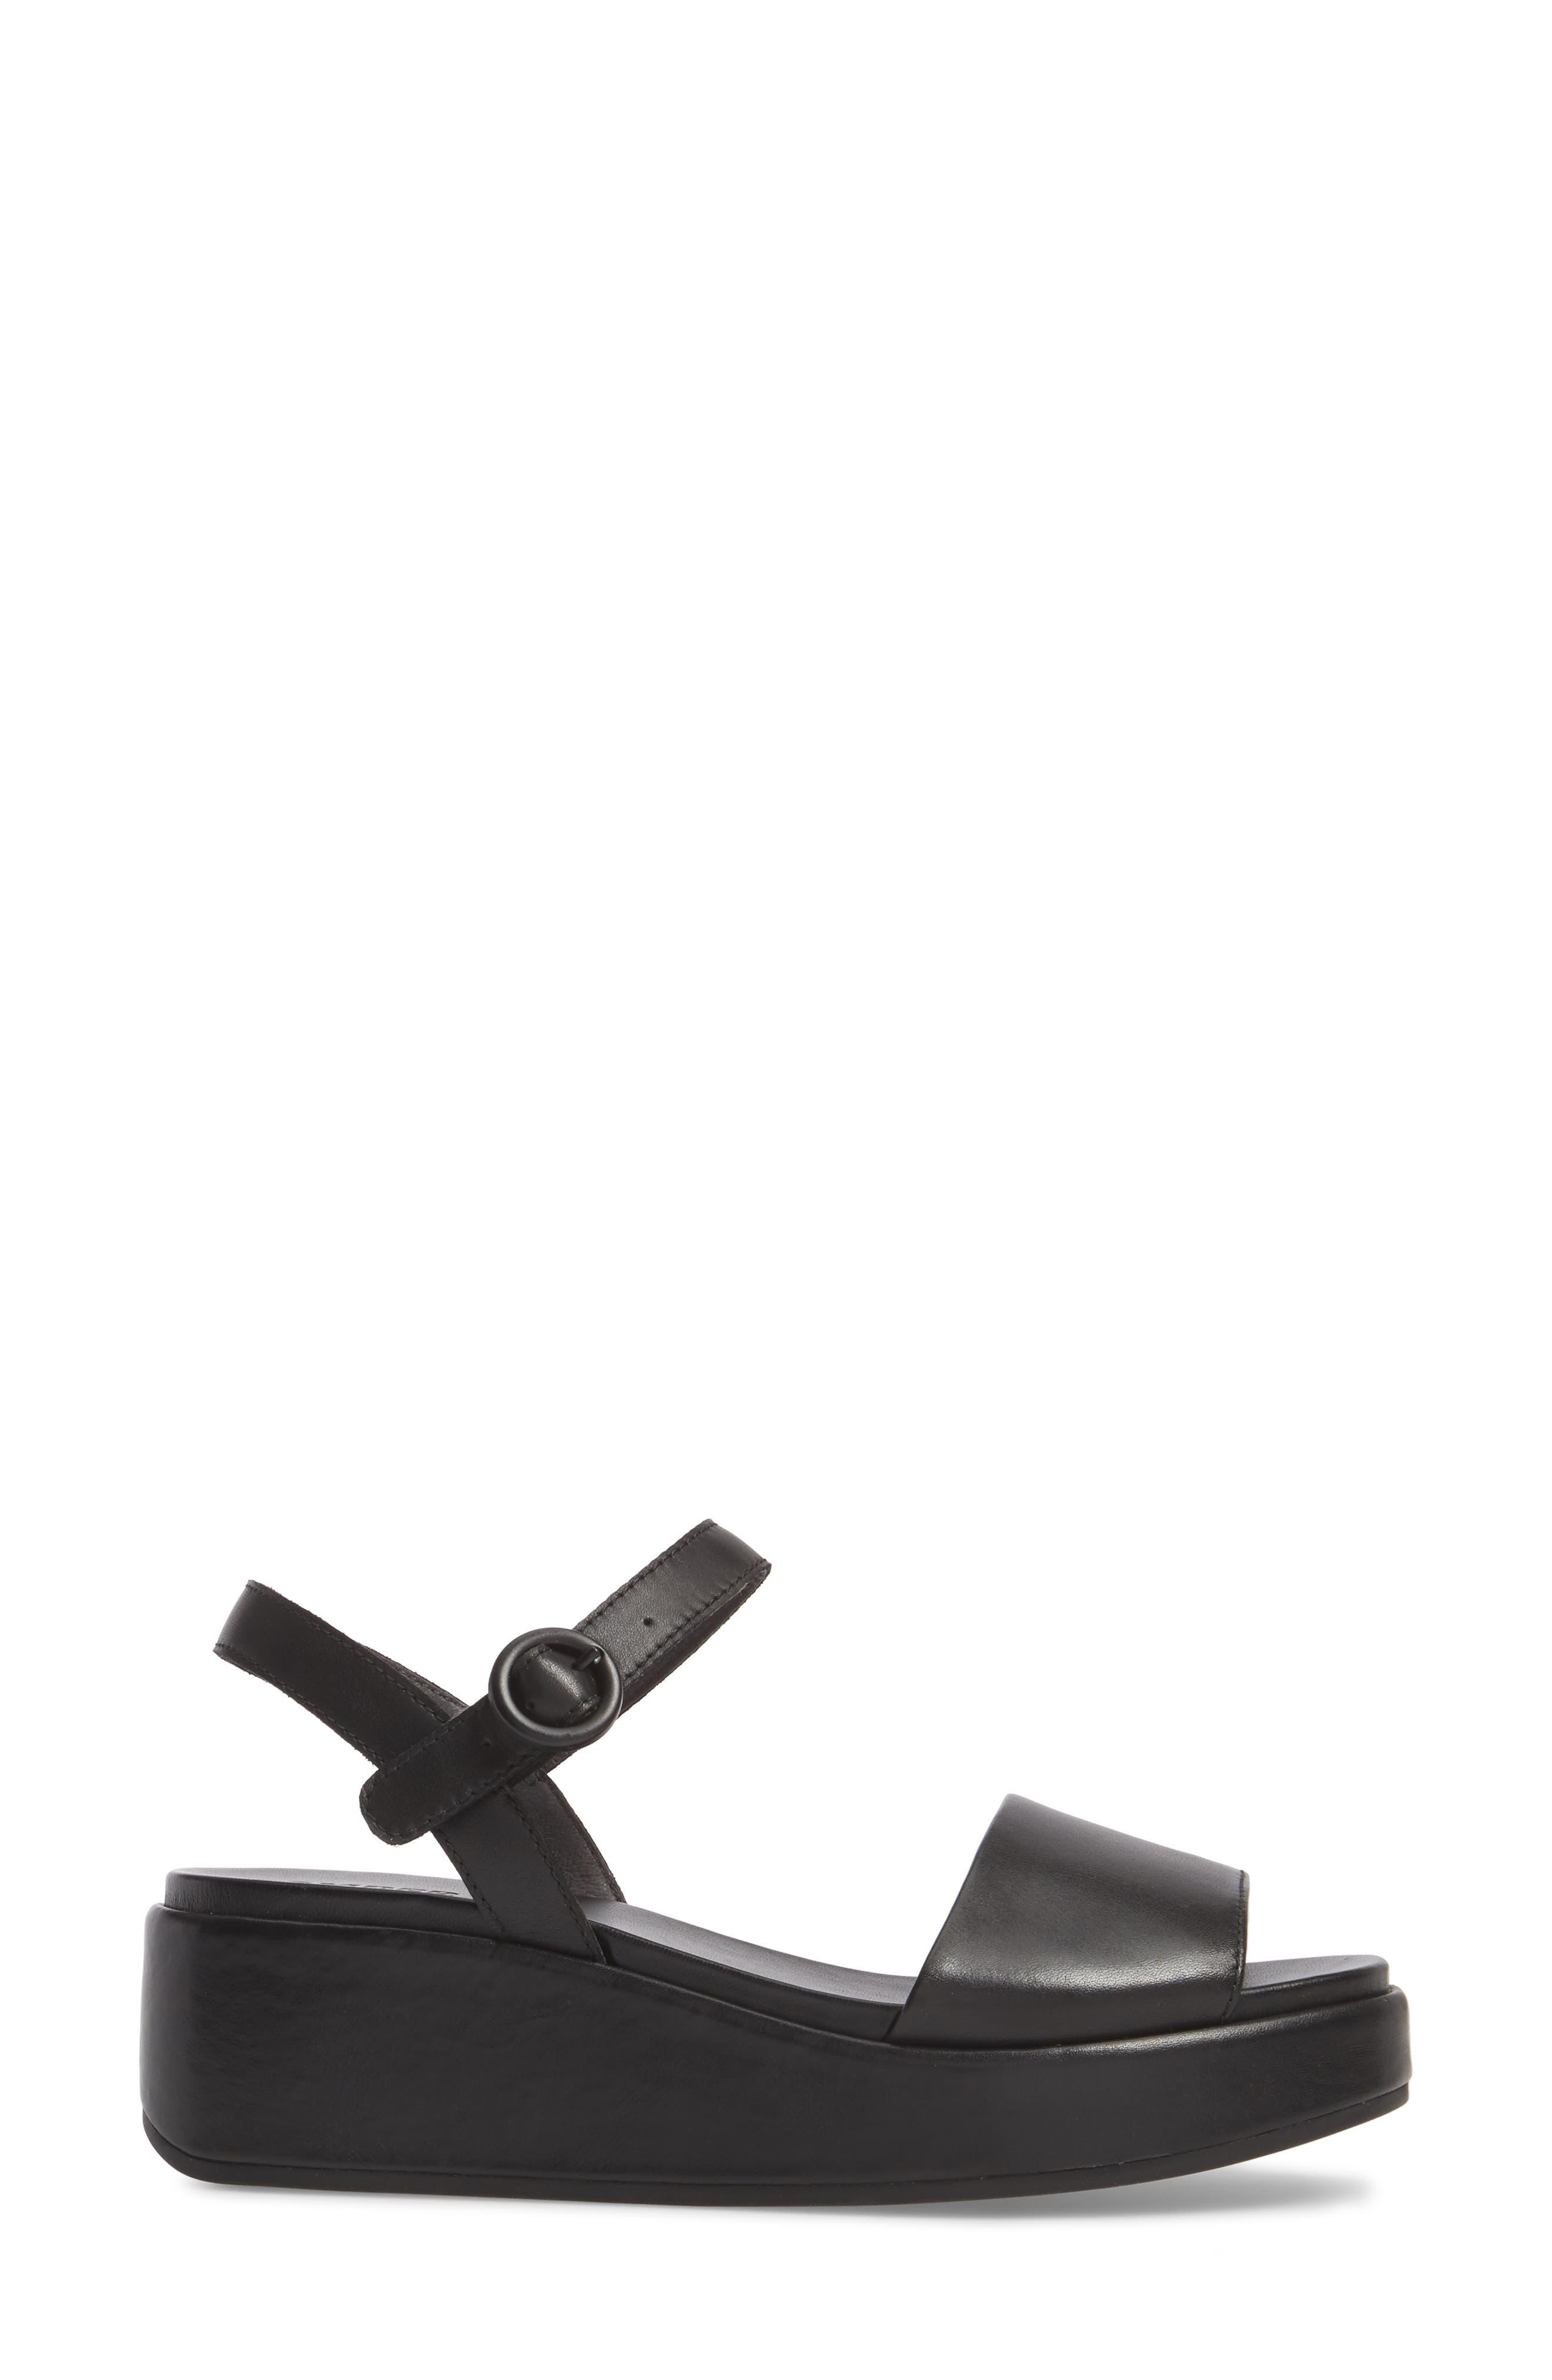 CAMPER, Misia Platform Wedge Sandal, Alternate thumbnail 3, color, BLACK LEATHER